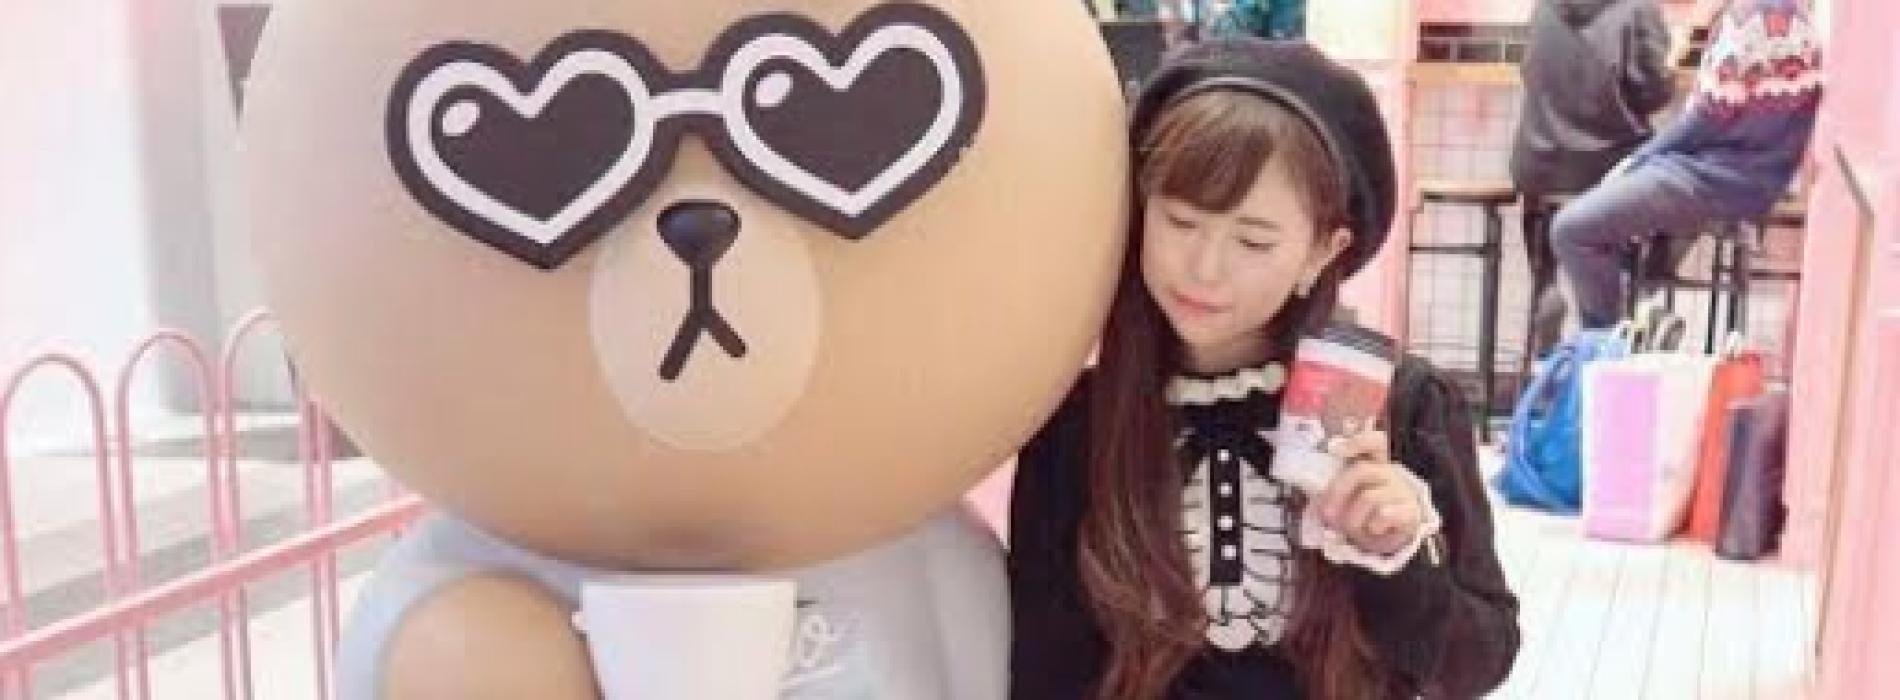 Dal Giappone ai social media, rapida ascesa dello stile kawaii